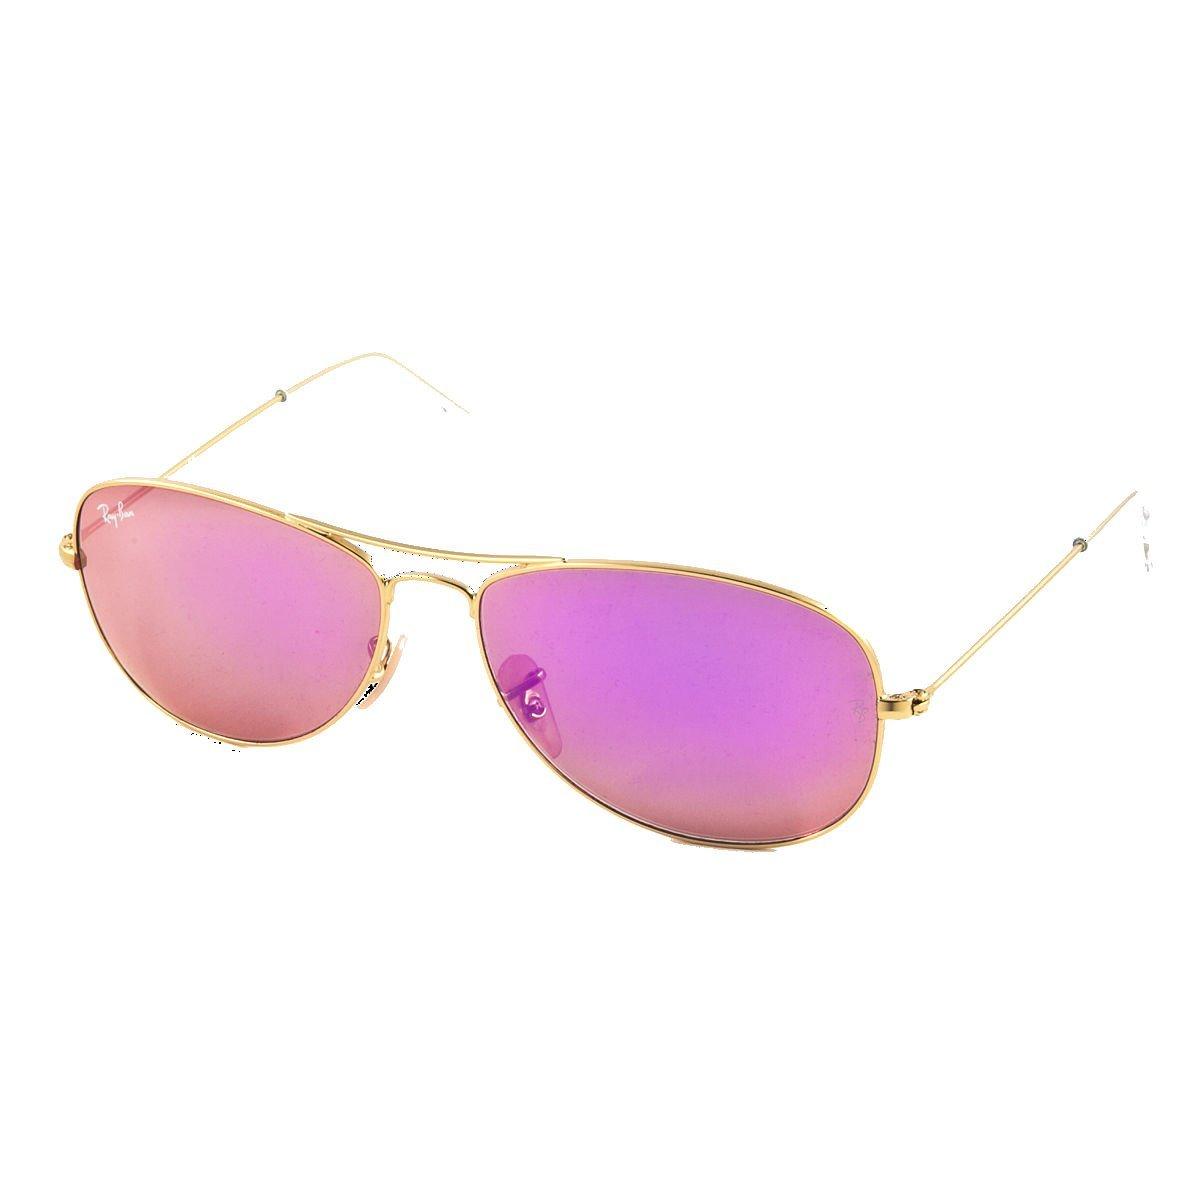 5a6290ded1 Amazon.com  Ray Ban RB3362 112 4T 56 Gold Cyclamen Mirror Cockpit  Sunglasses Bundle-2 Items  Shoes